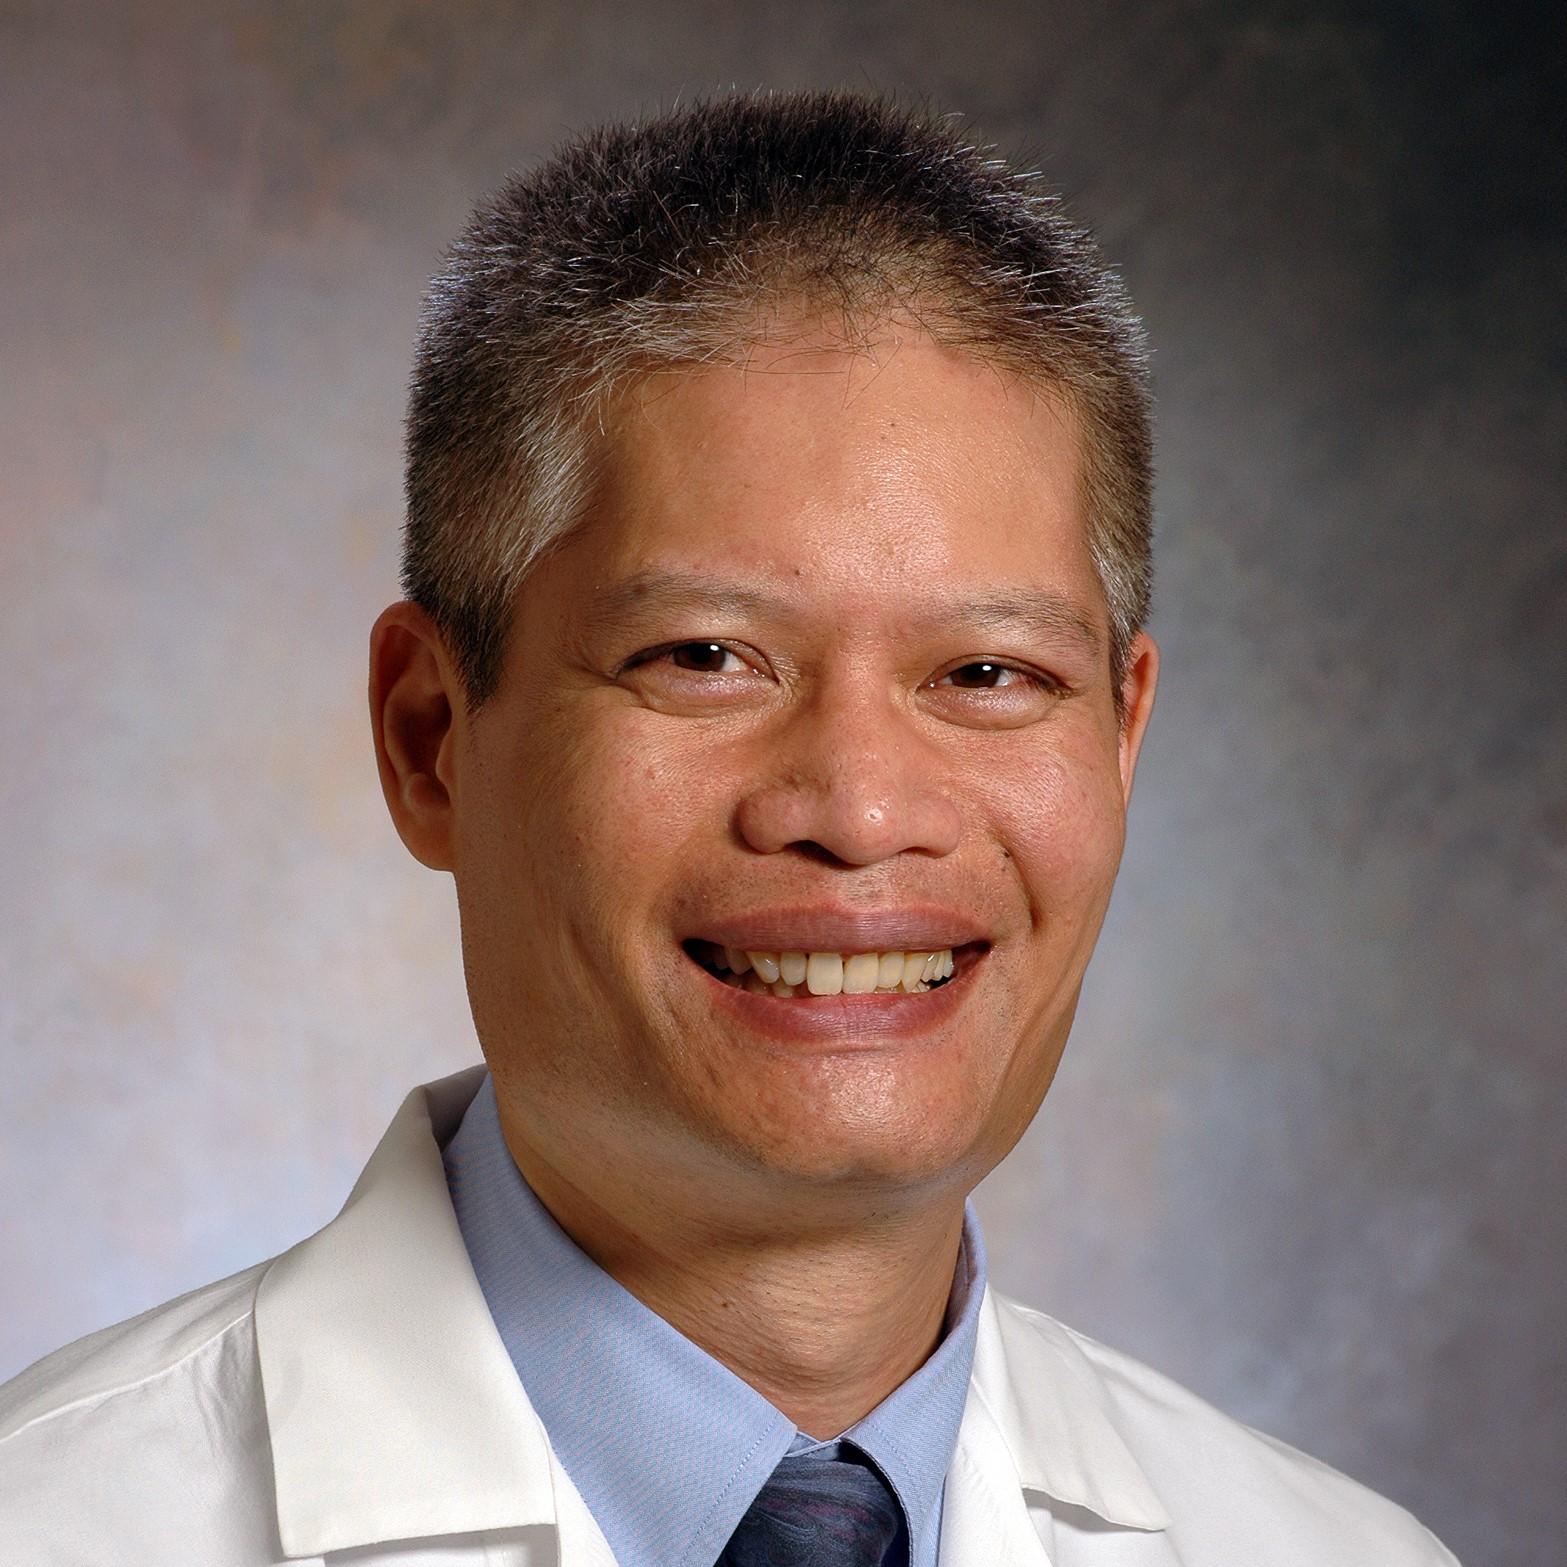 Marshall Chin, MD, MPH